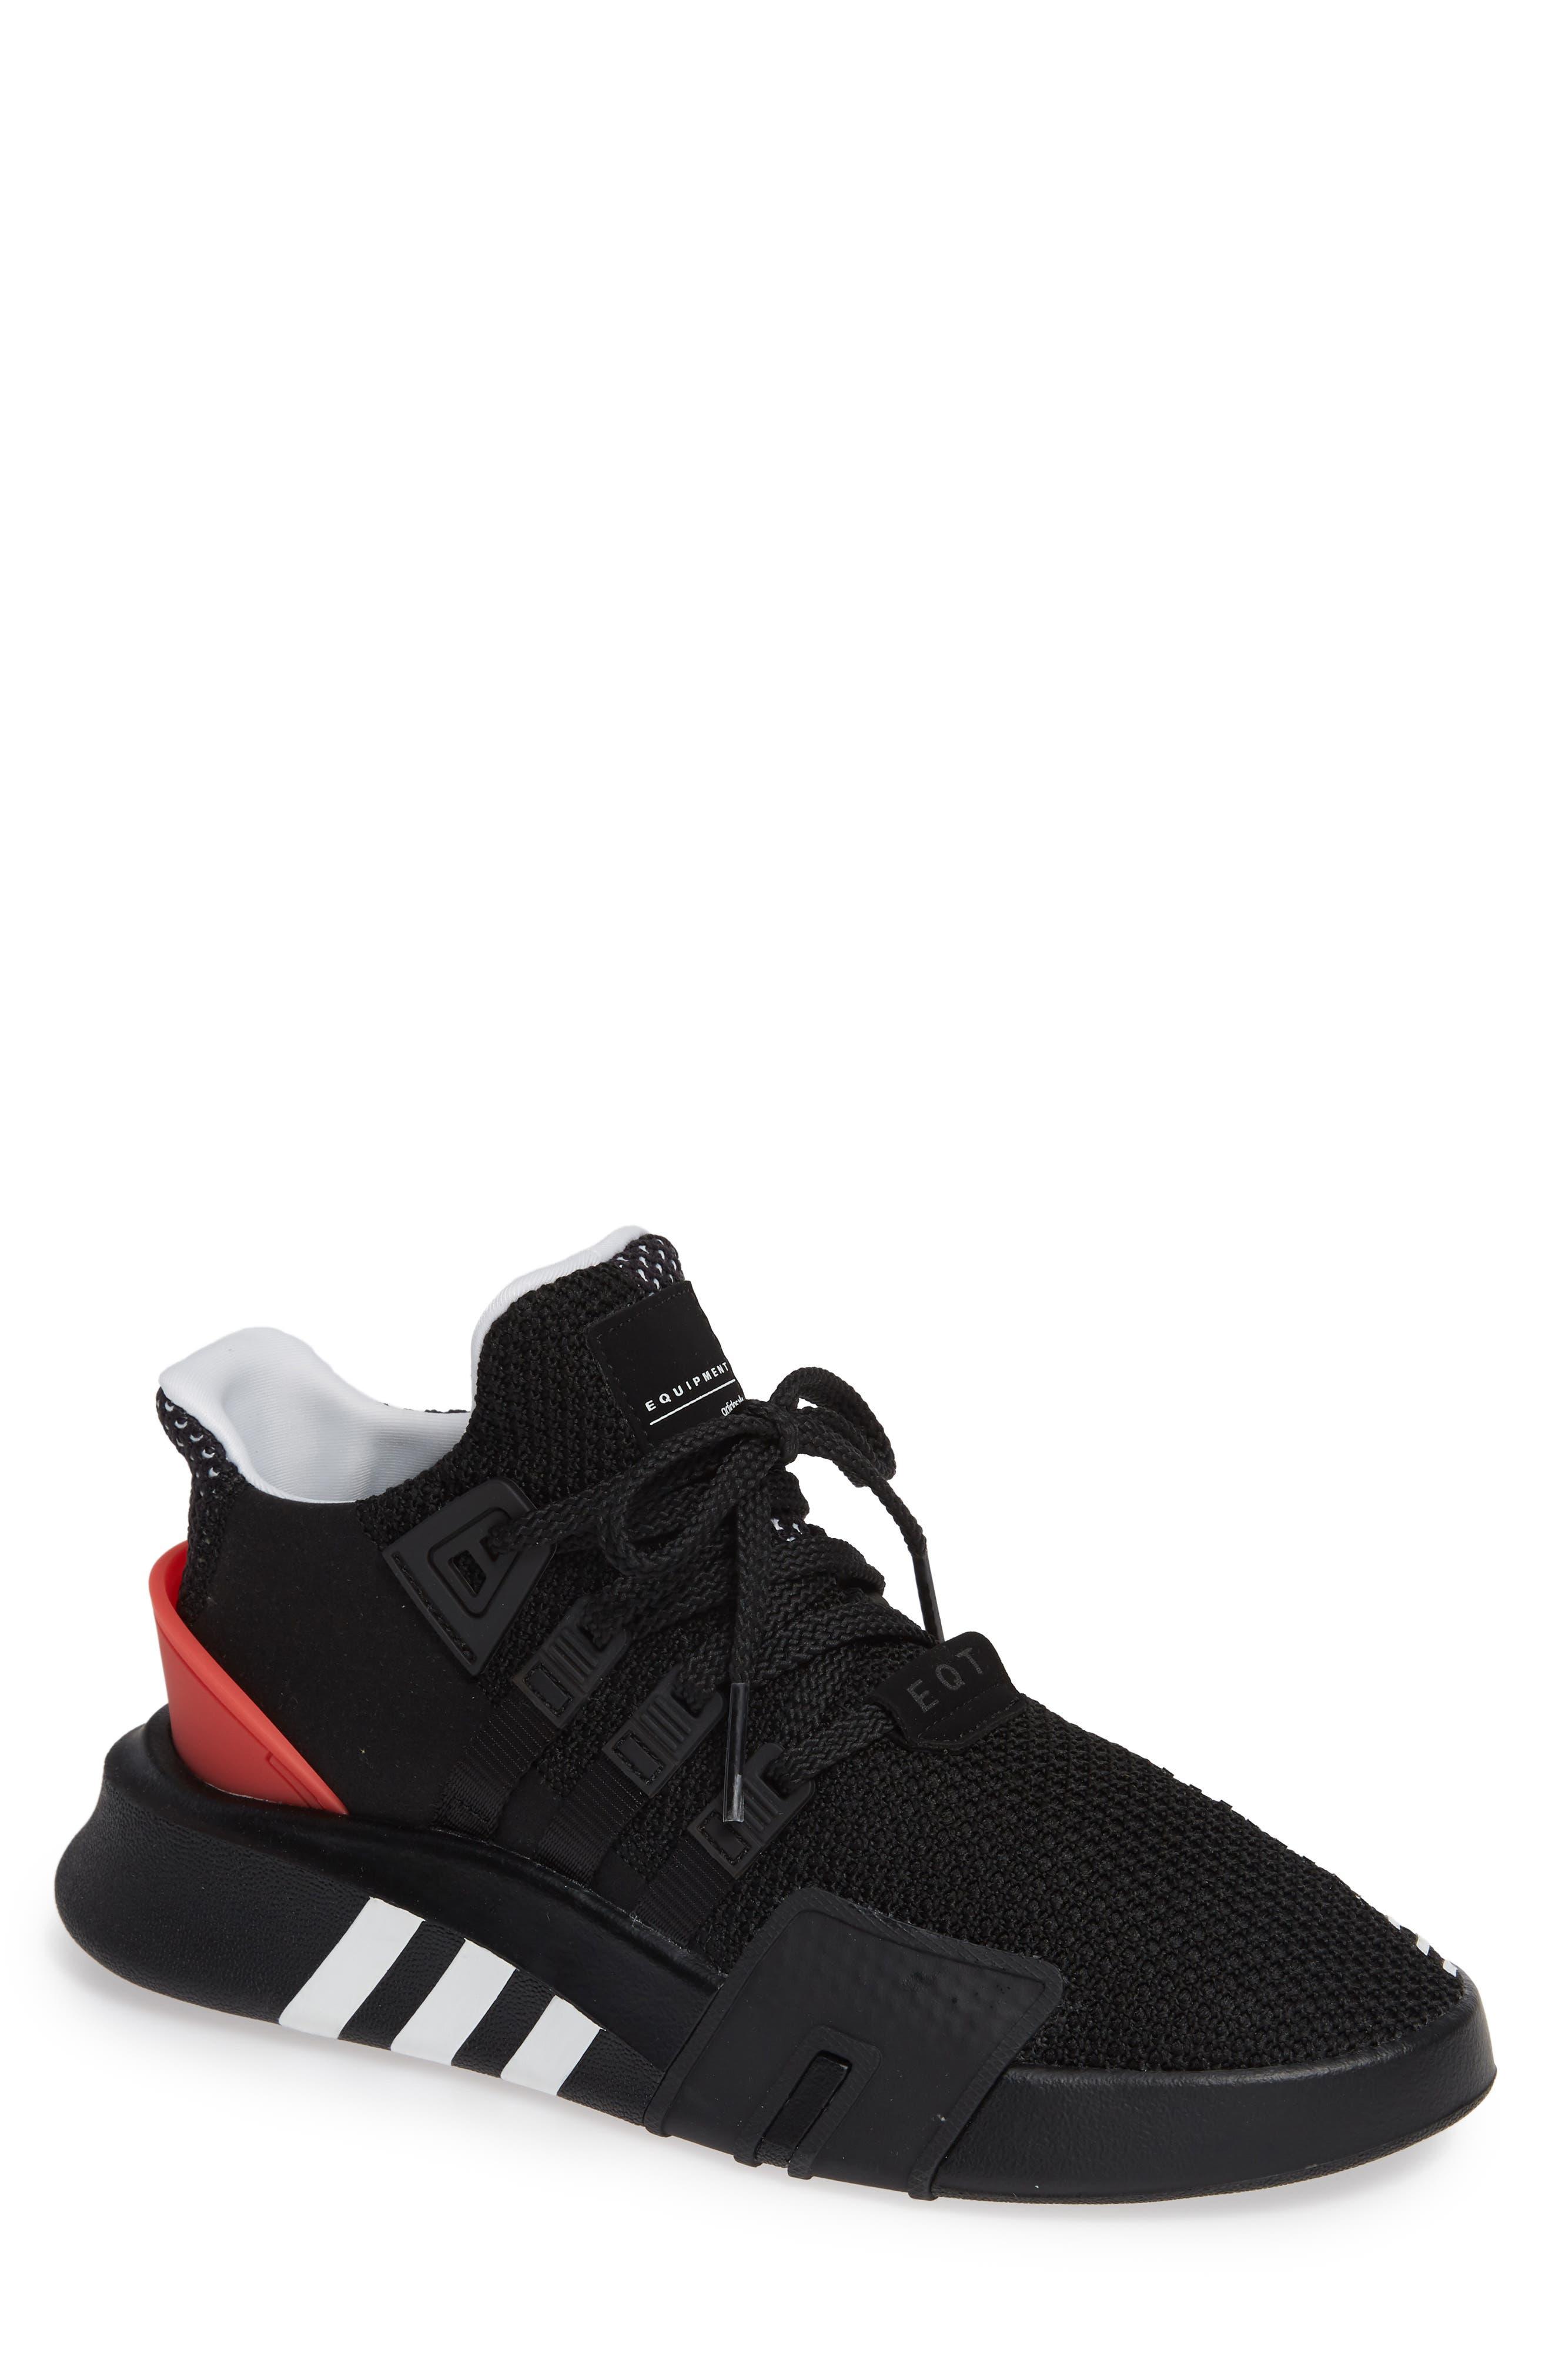 EQT Basketball ADV Sneaker,                         Main,                         color, Black/ White/ Hi-Res Red